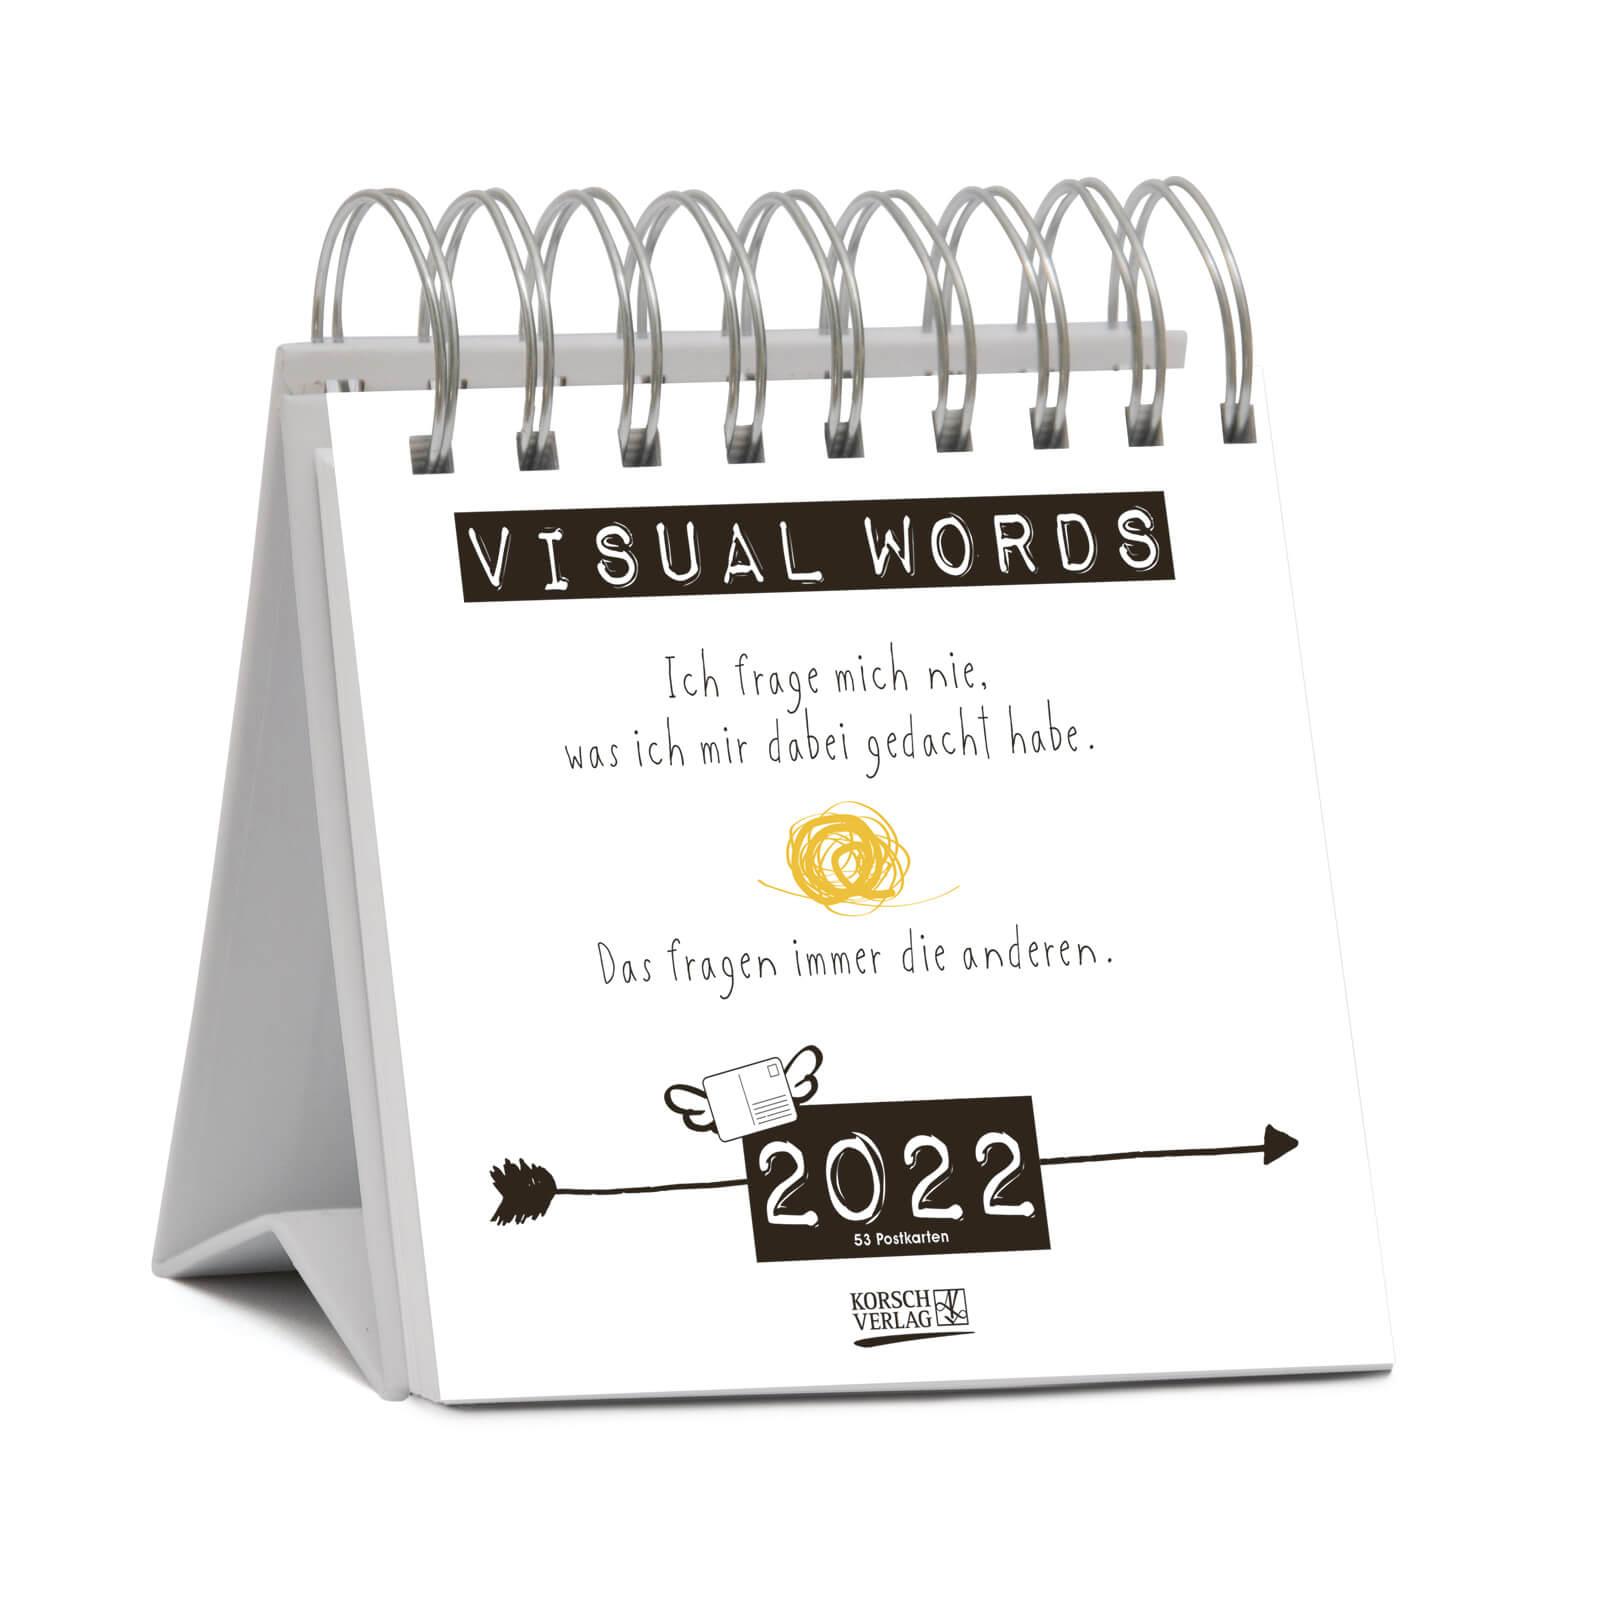 Visual Words 2022, Art. 235922